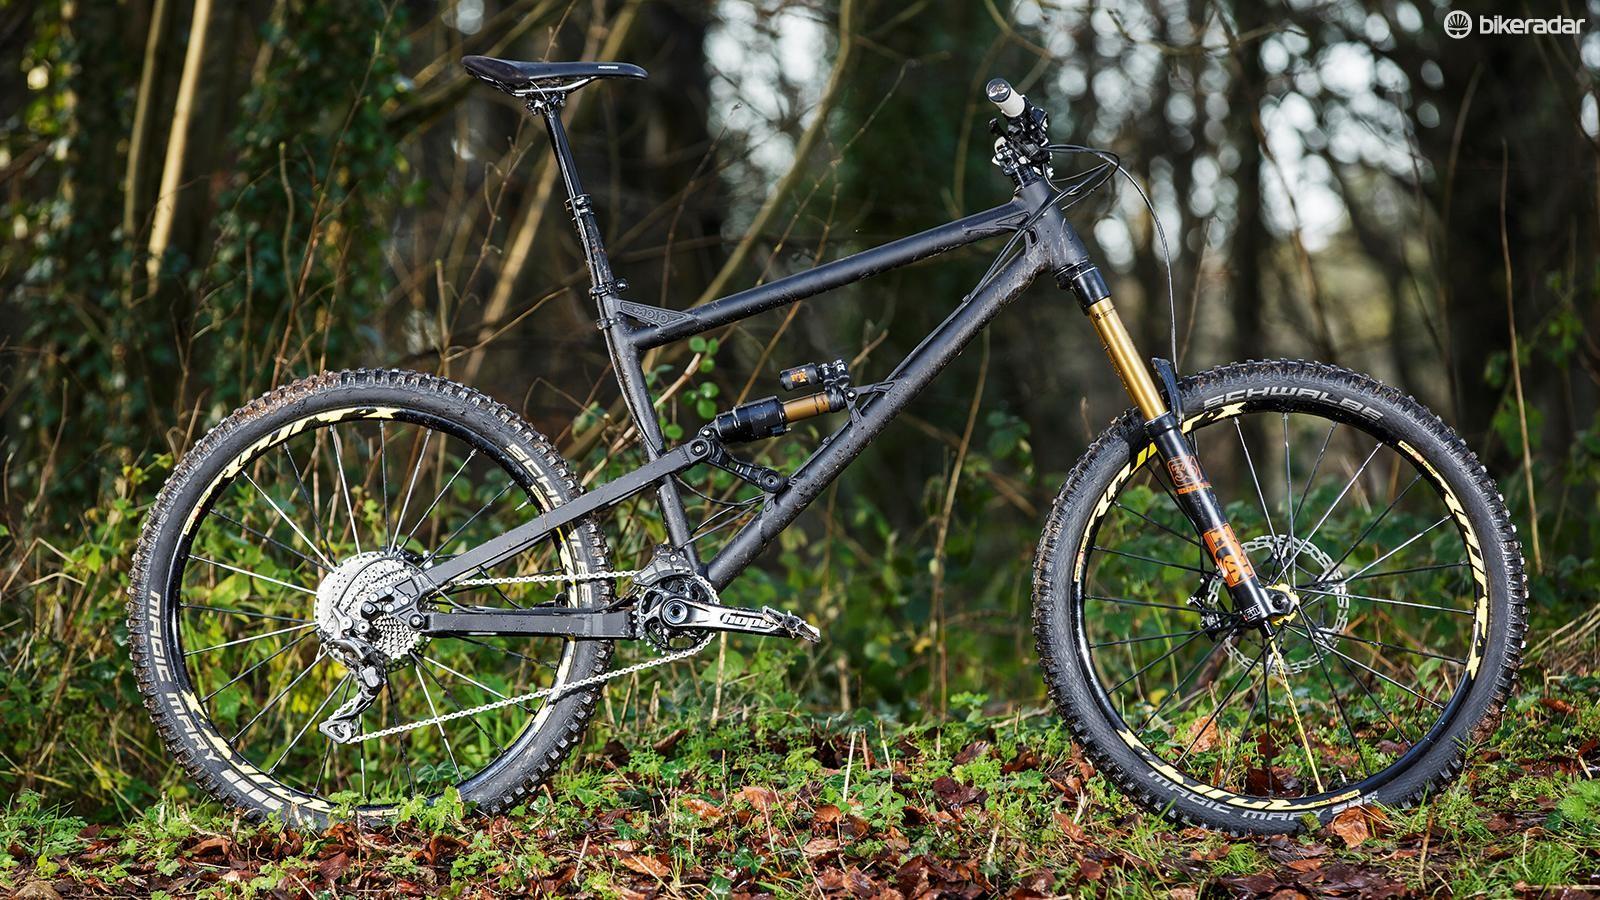 Radical mountain bike geometry is becoming more mainstream, but Mojo/Nicolai's GeoMetron is pushing the envelope